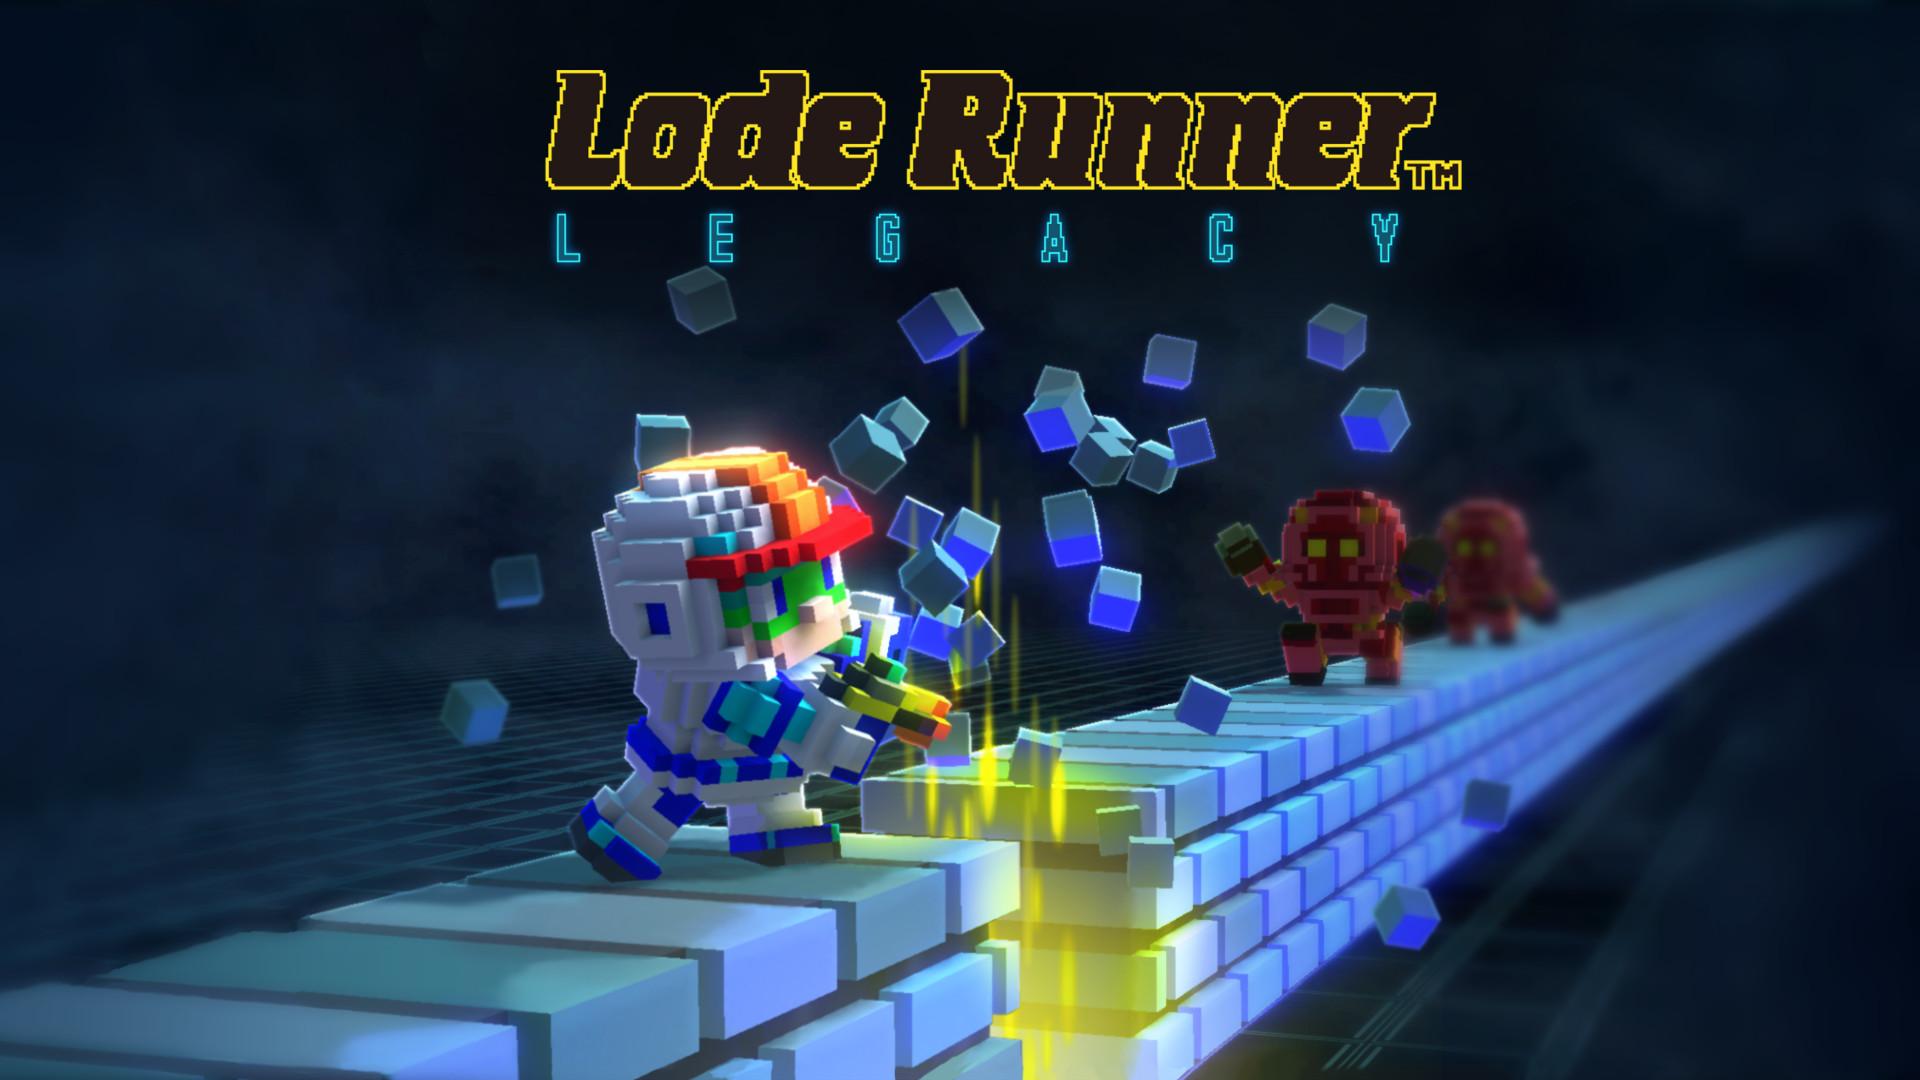 LodeRunnerLegacy keyVisual withLogo